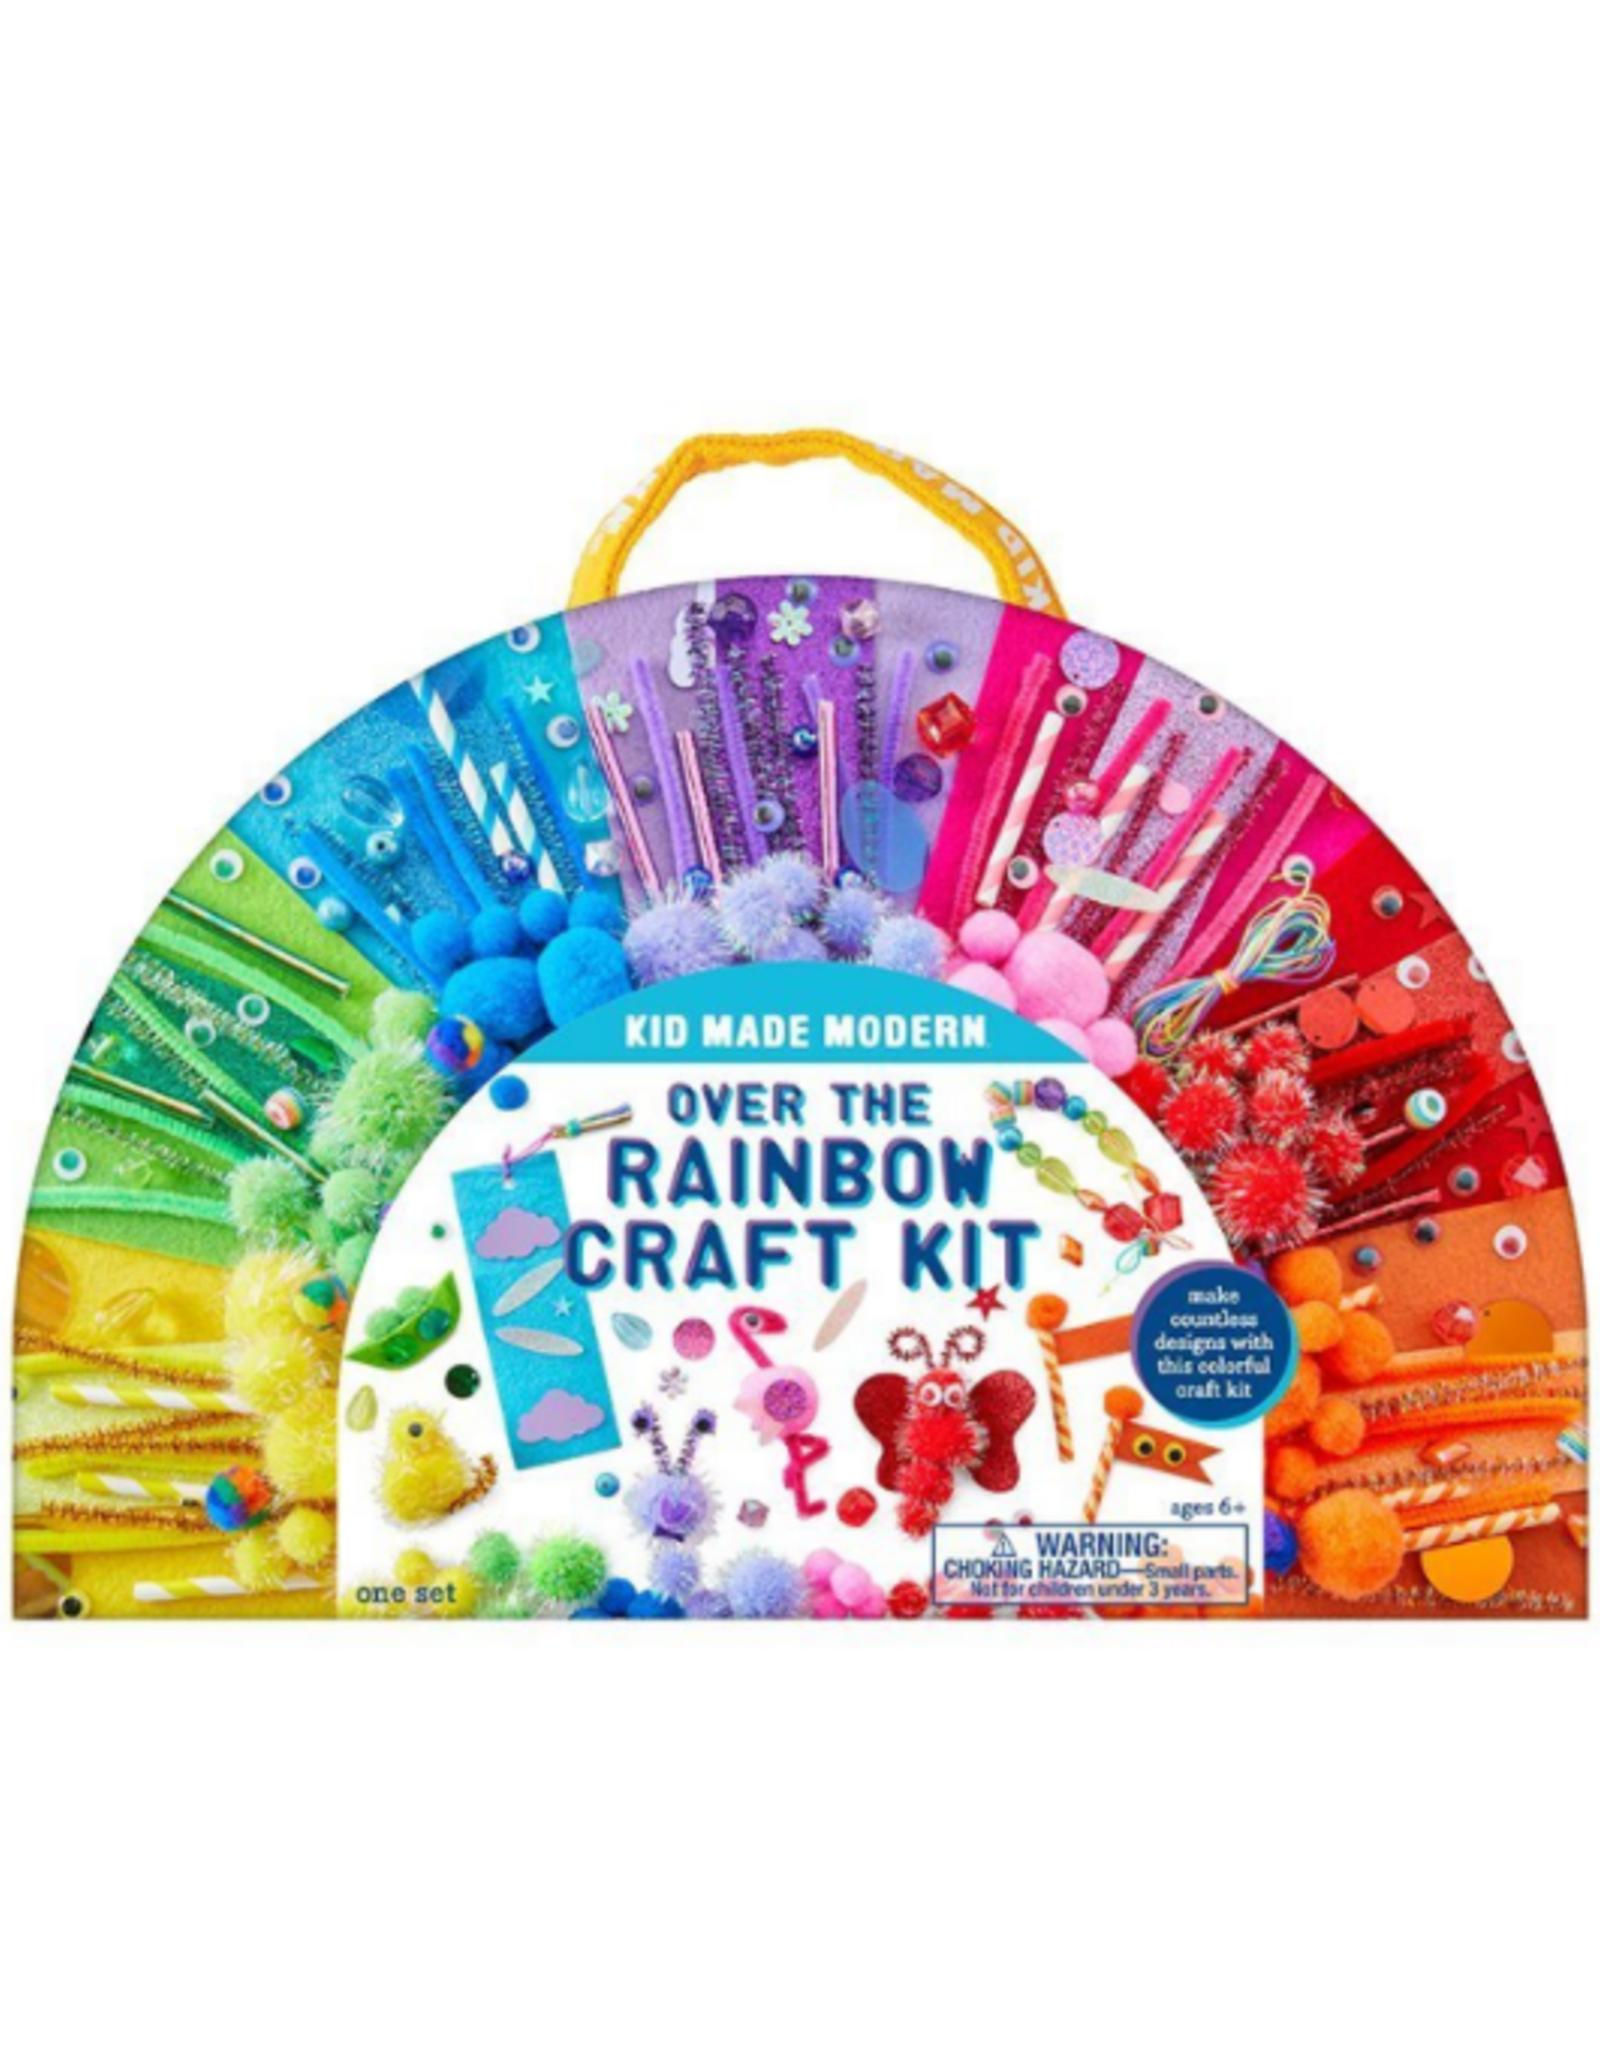 Over the Rainbow Craft Kit